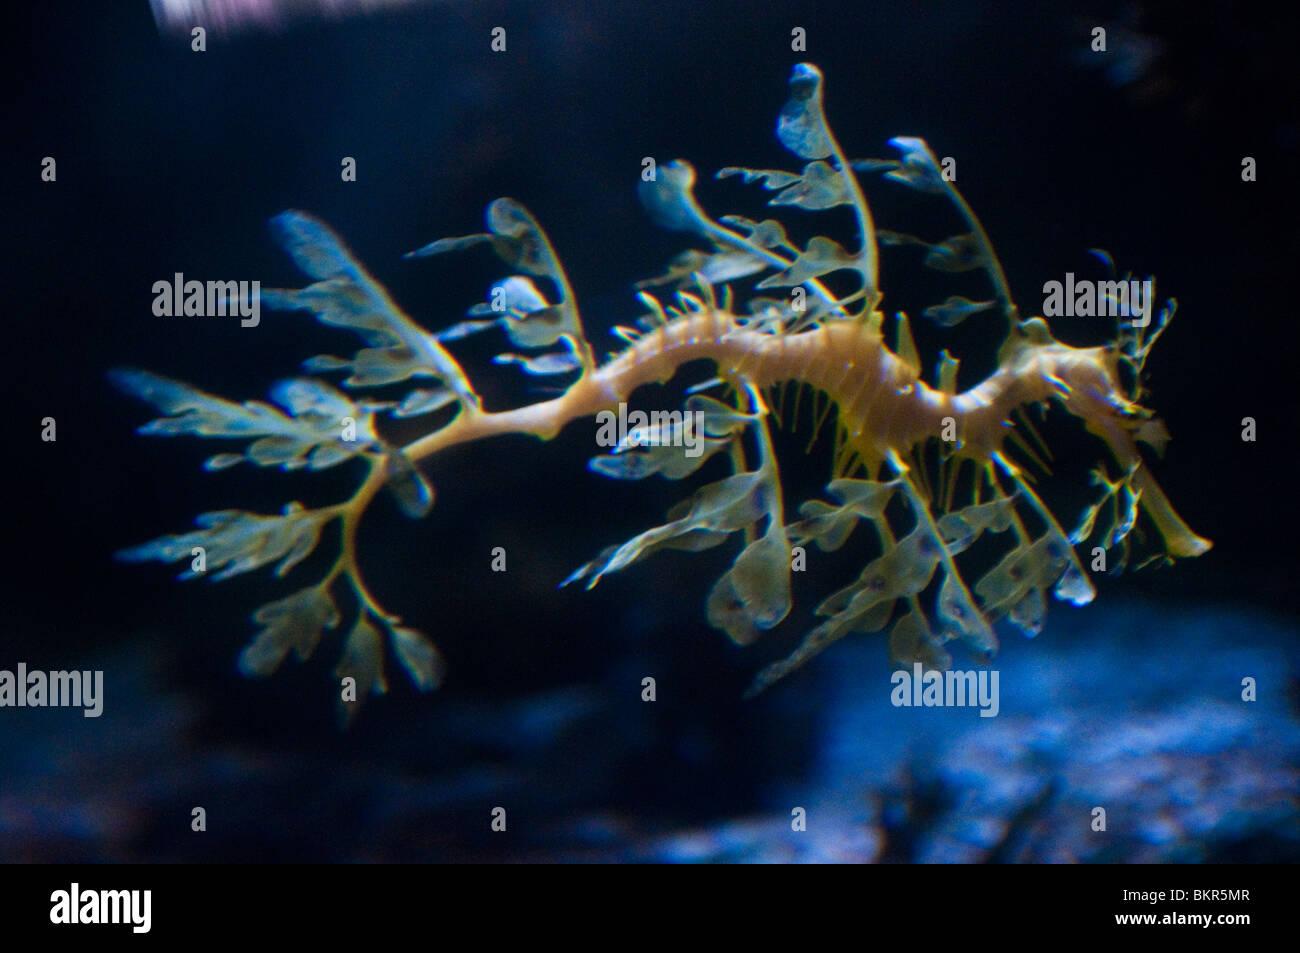 Leafy Sea Dragon, Phycodurus eques, Sydney Aquarium, Sydney, Australia - Stock Image